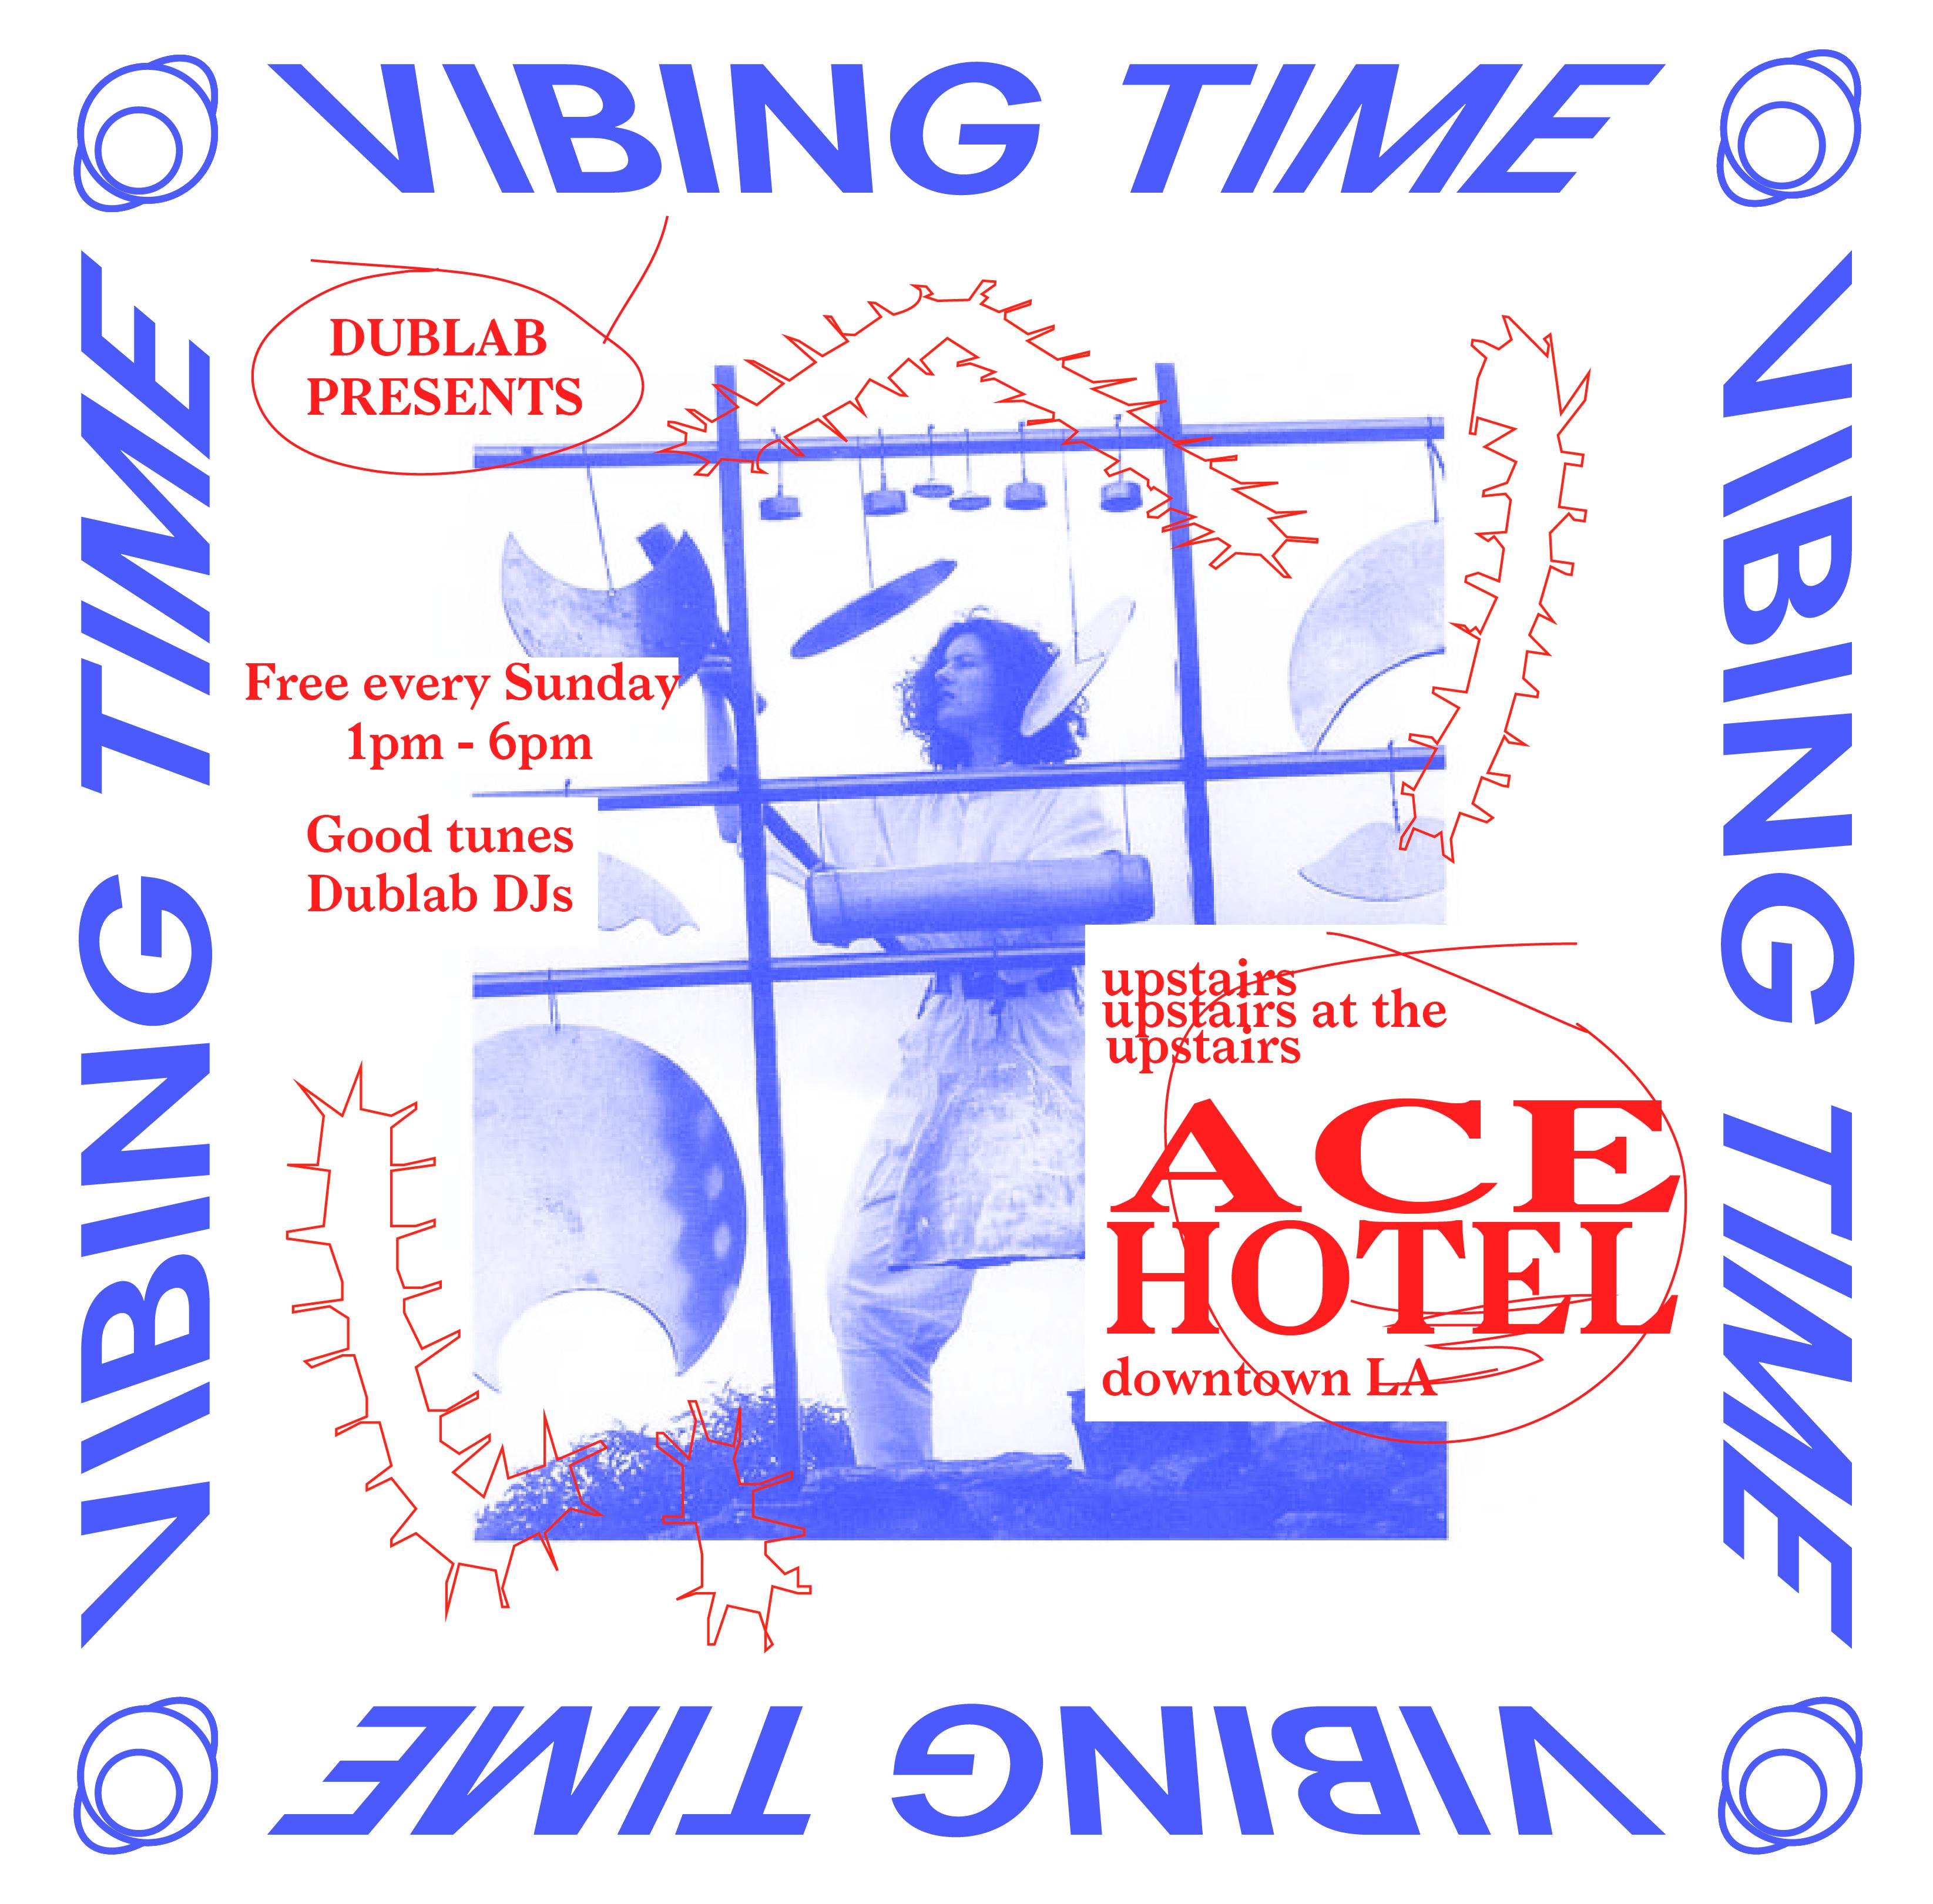 20161023 - Dublab Vibing Time 2017 V5